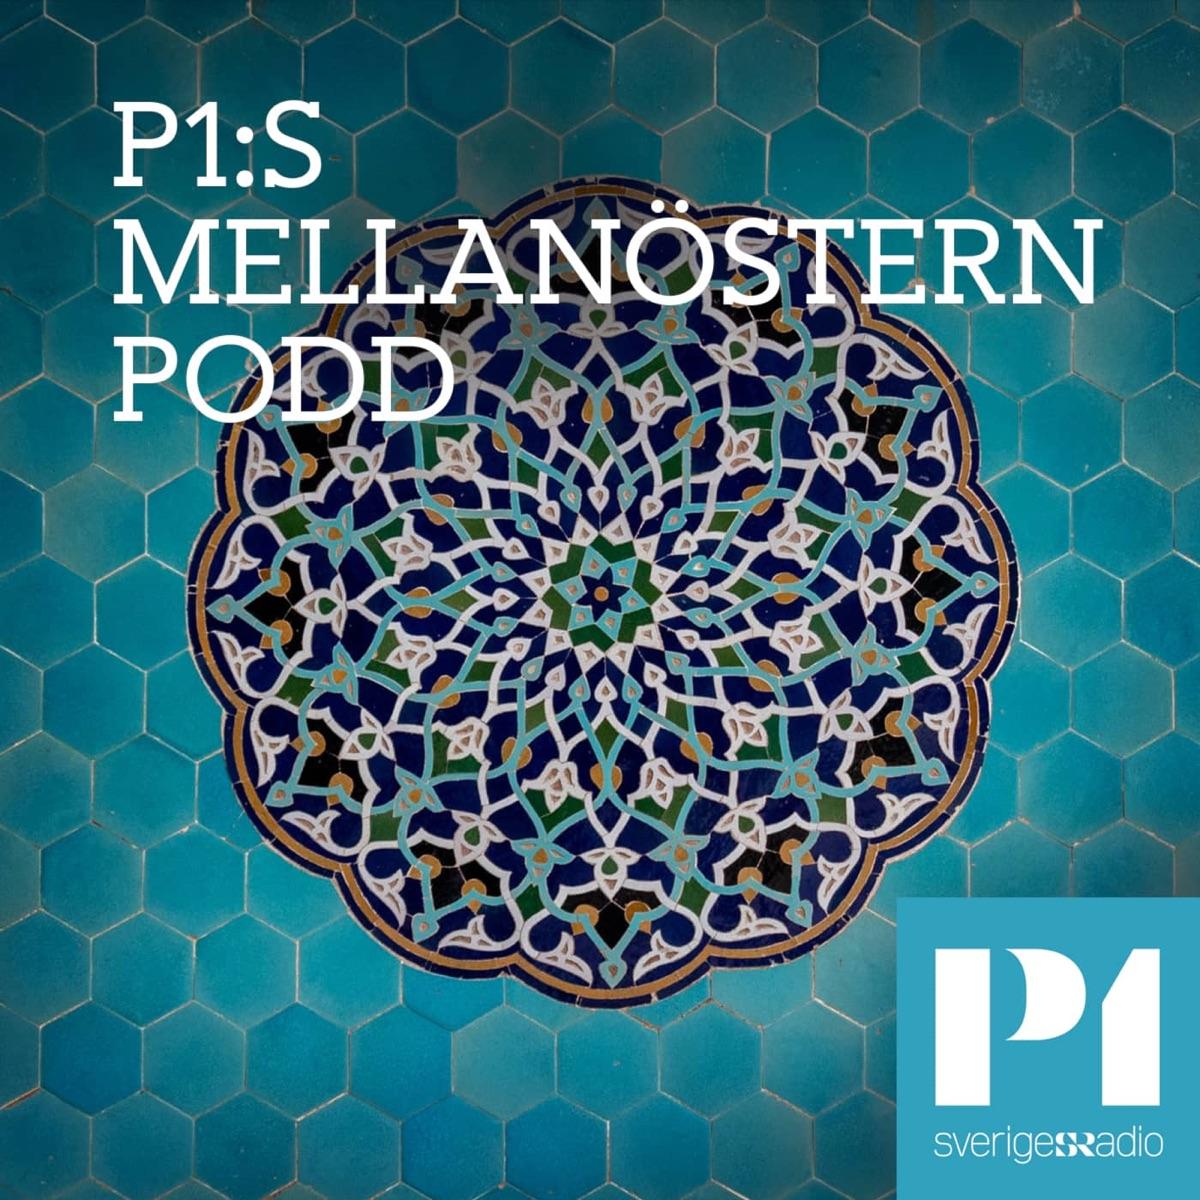 P1:s Mellanösternpodd